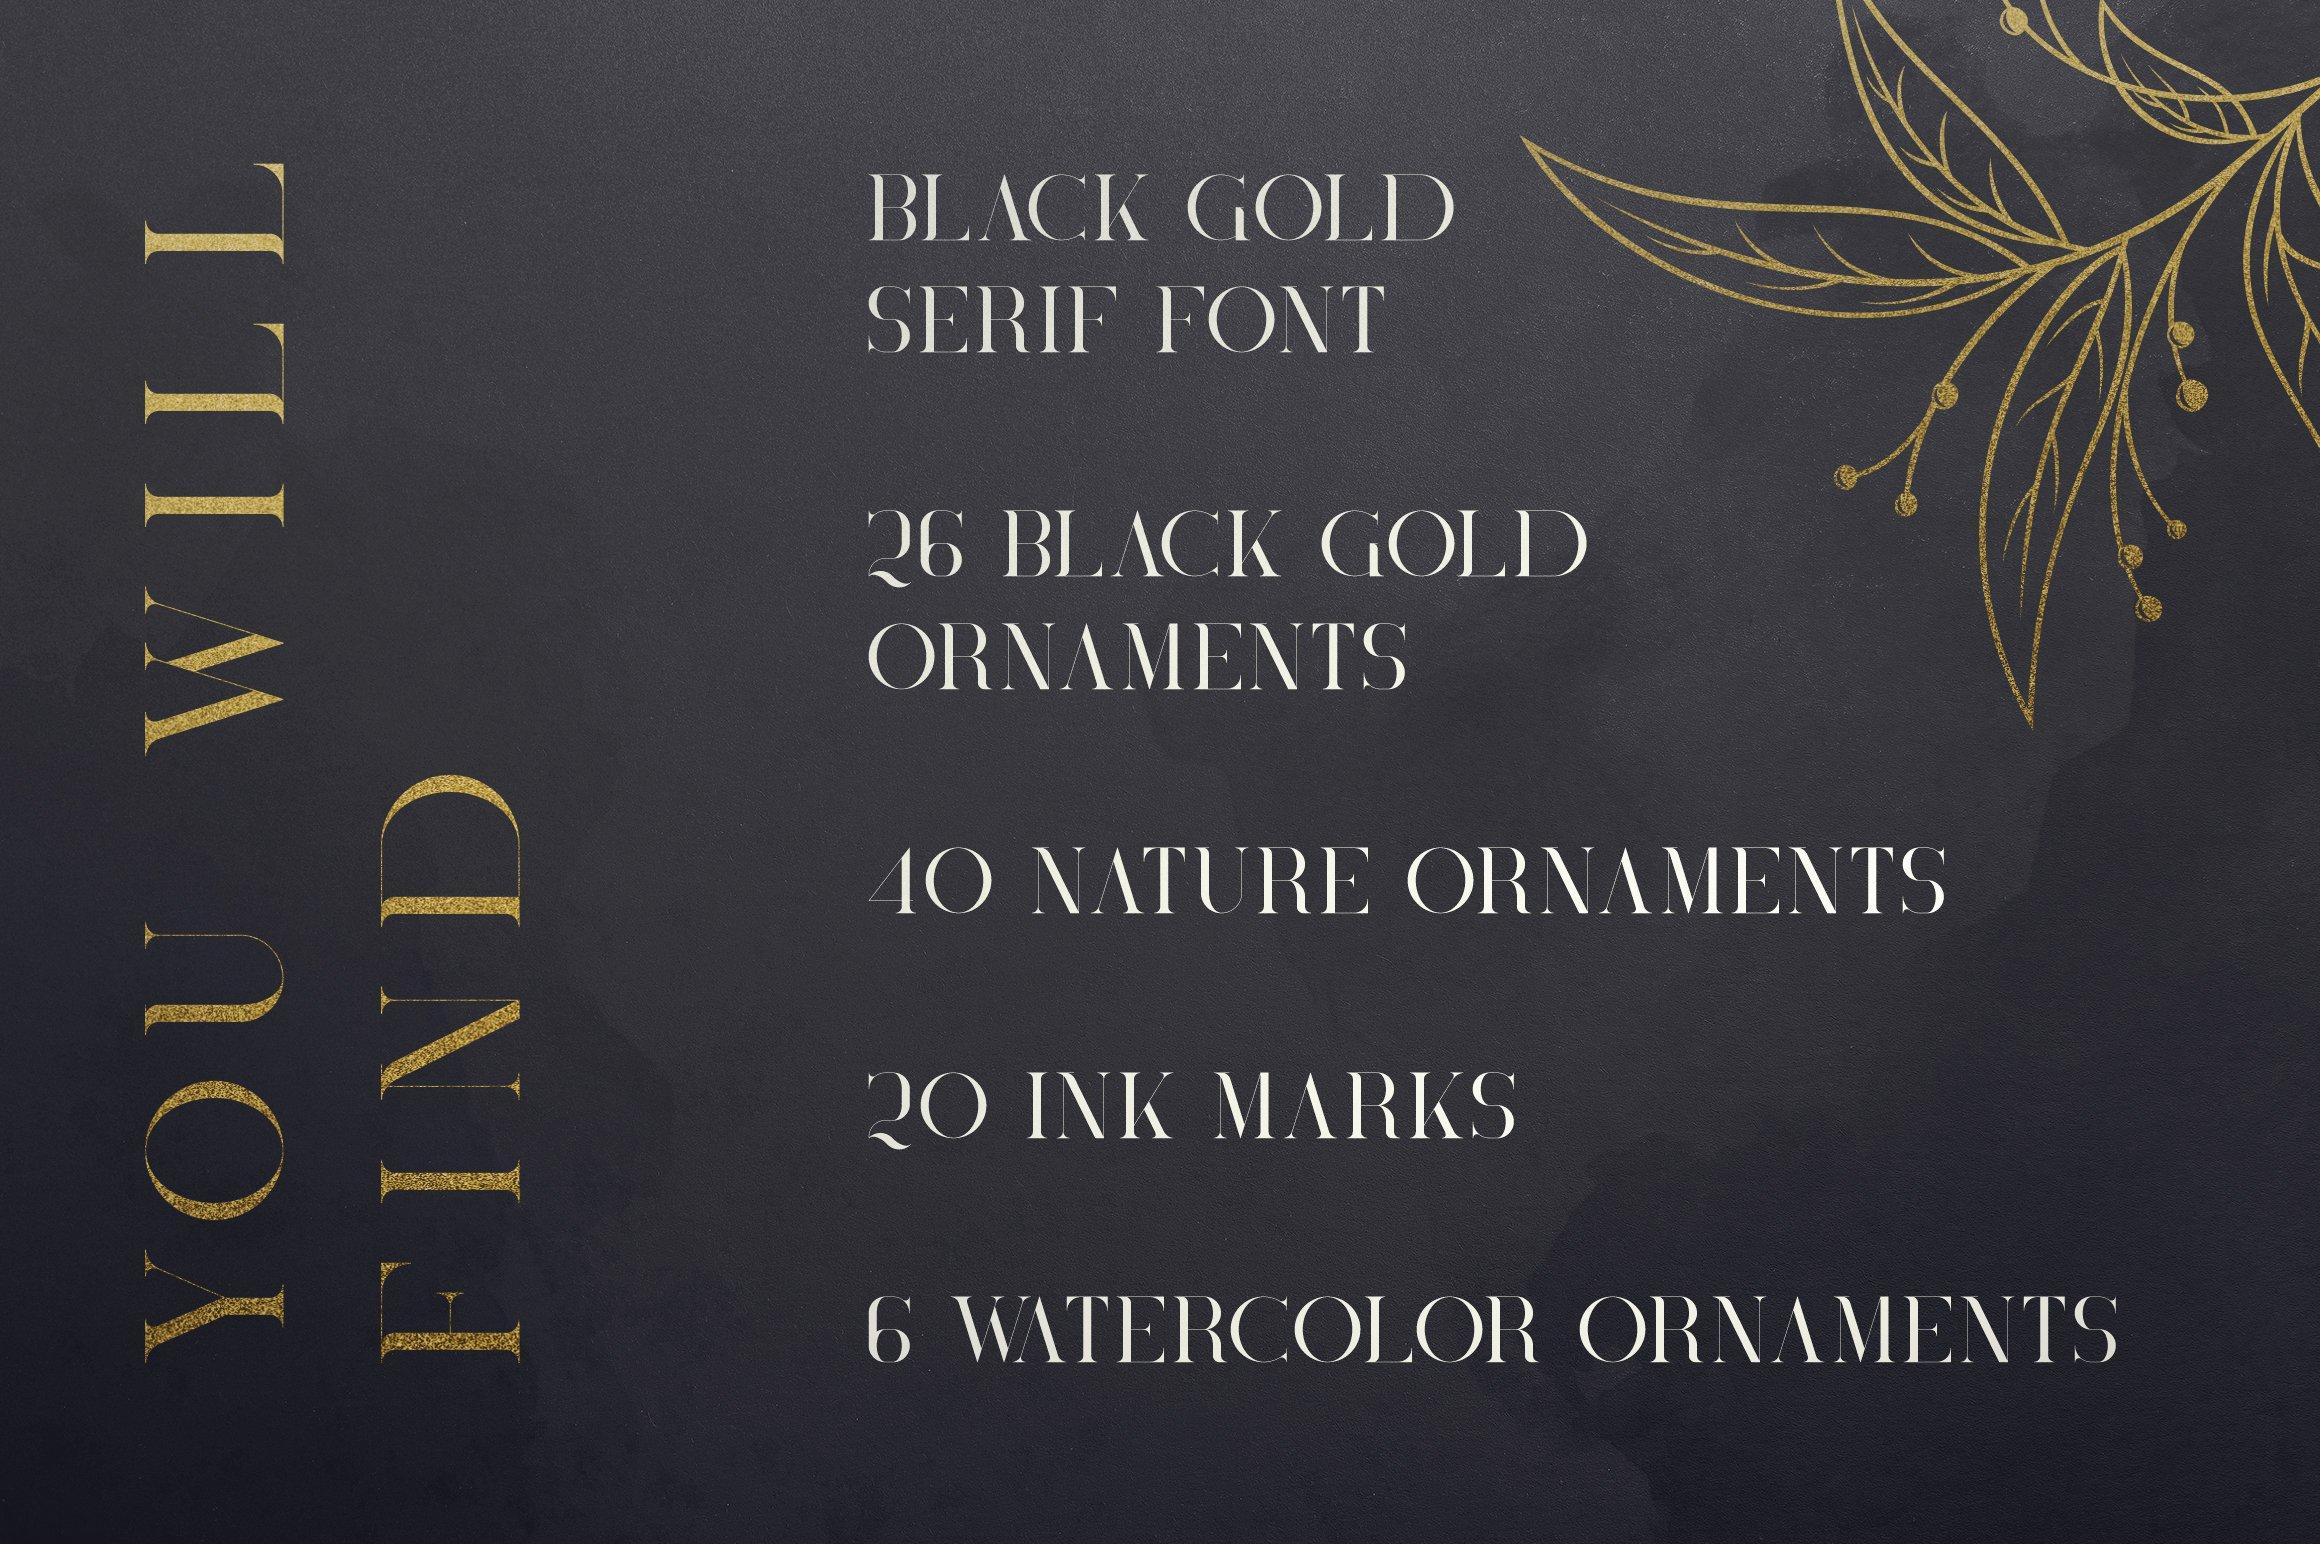 Black Gold Bundle: Serif Font, Elements, Ornaments, Photoshop Styles - $19 - 2